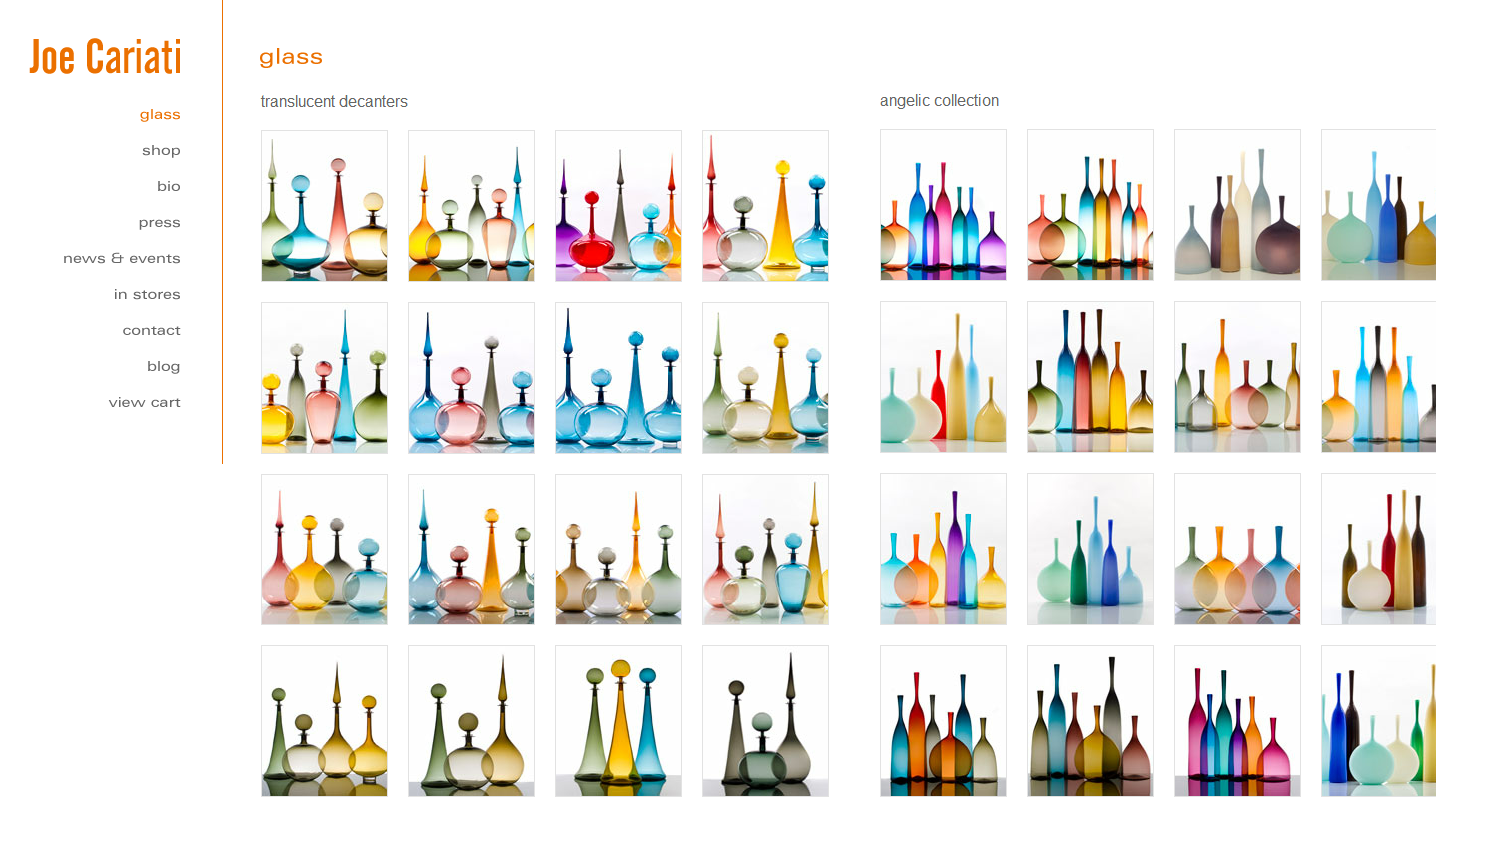 joe cariati handcrafted glass decanters